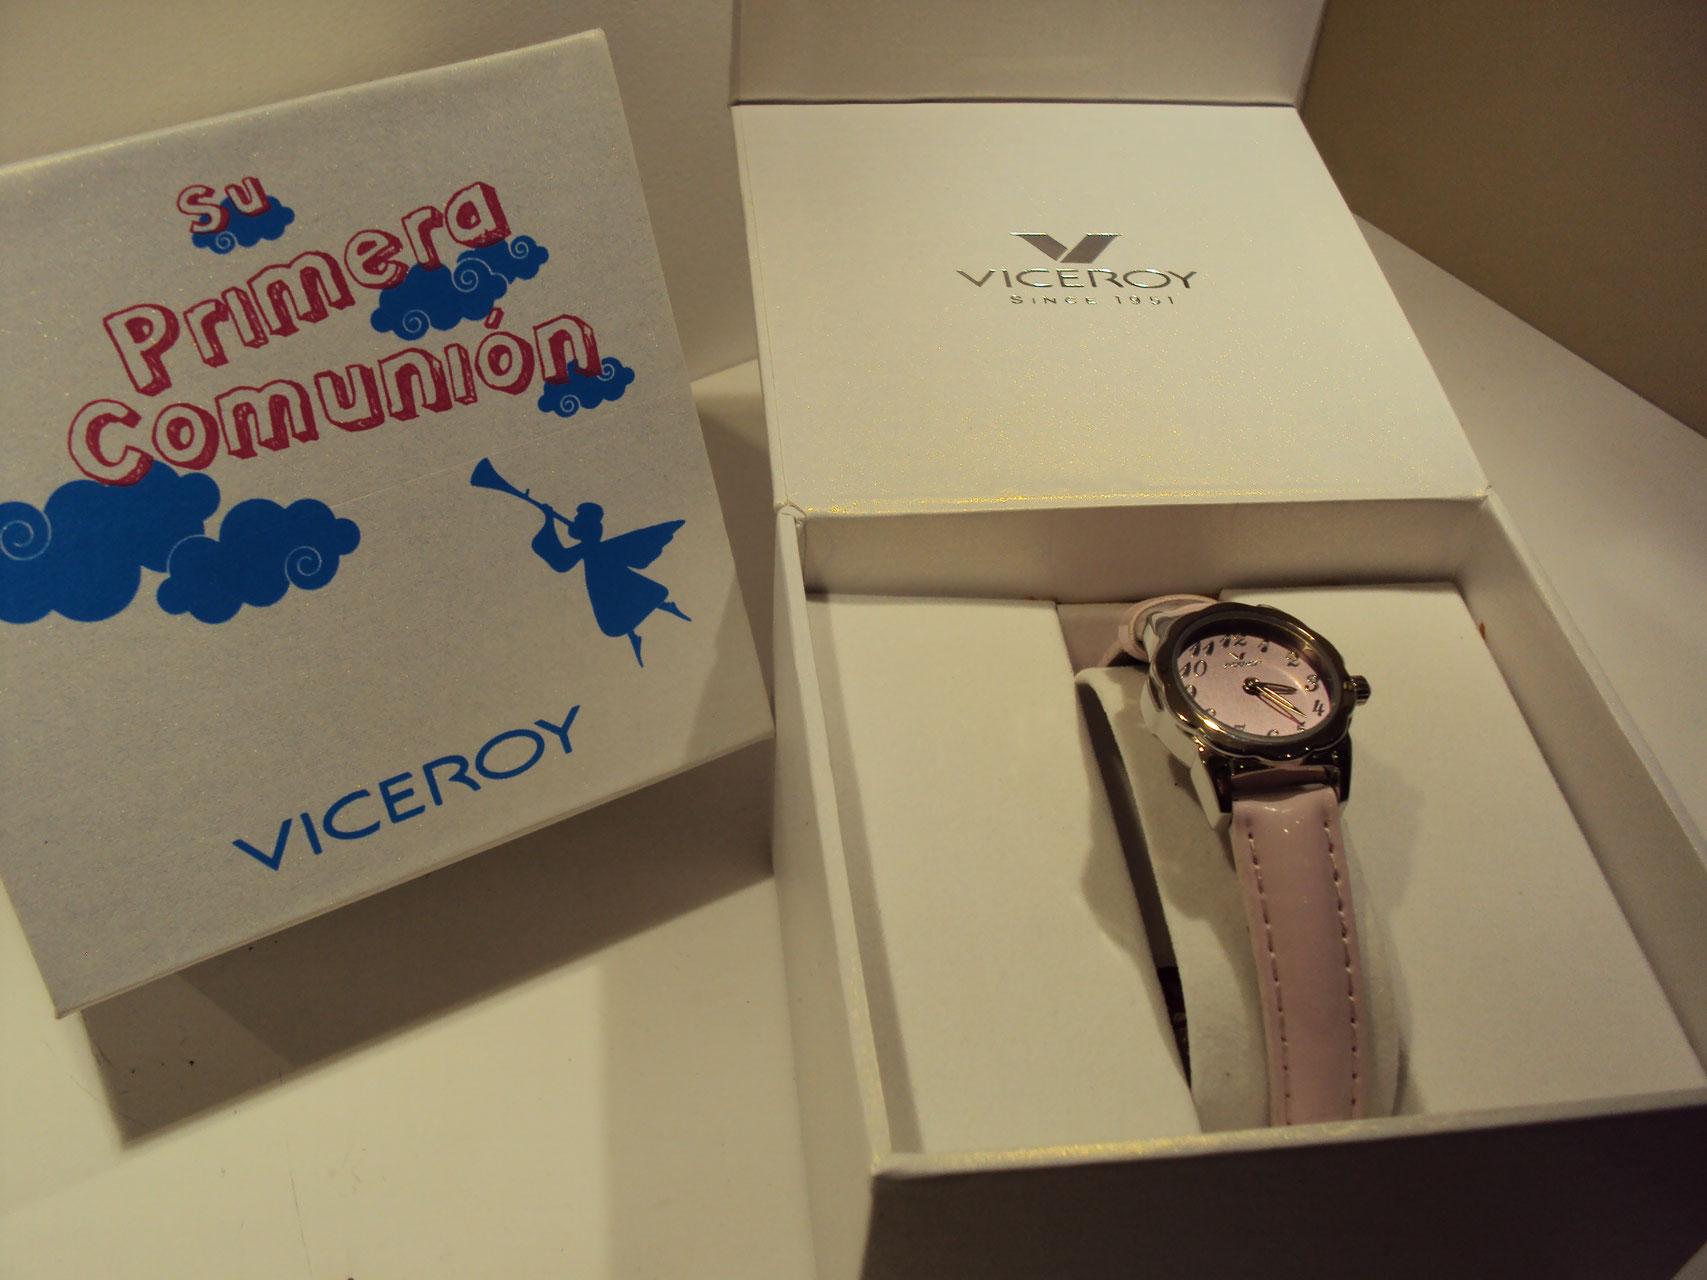 Reloj Viceroy redondo rosa.49€